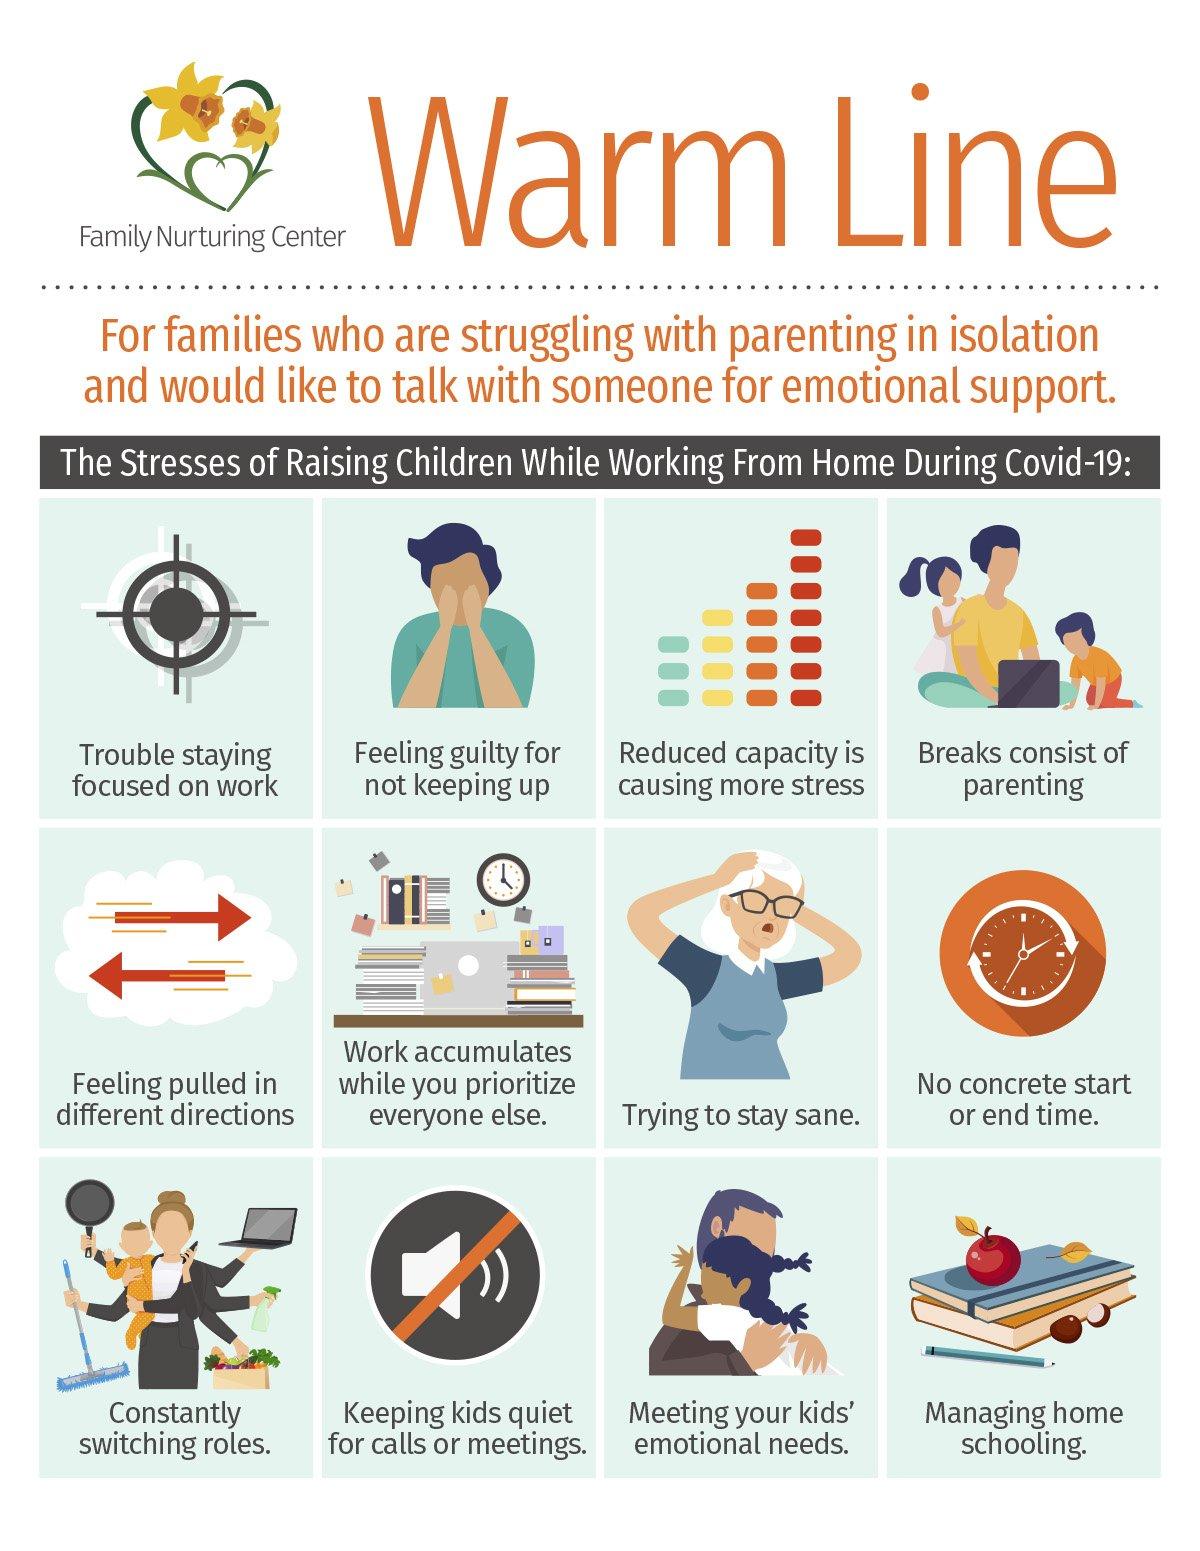 Family Nurturing Center, Warm Line, for Emotional Support